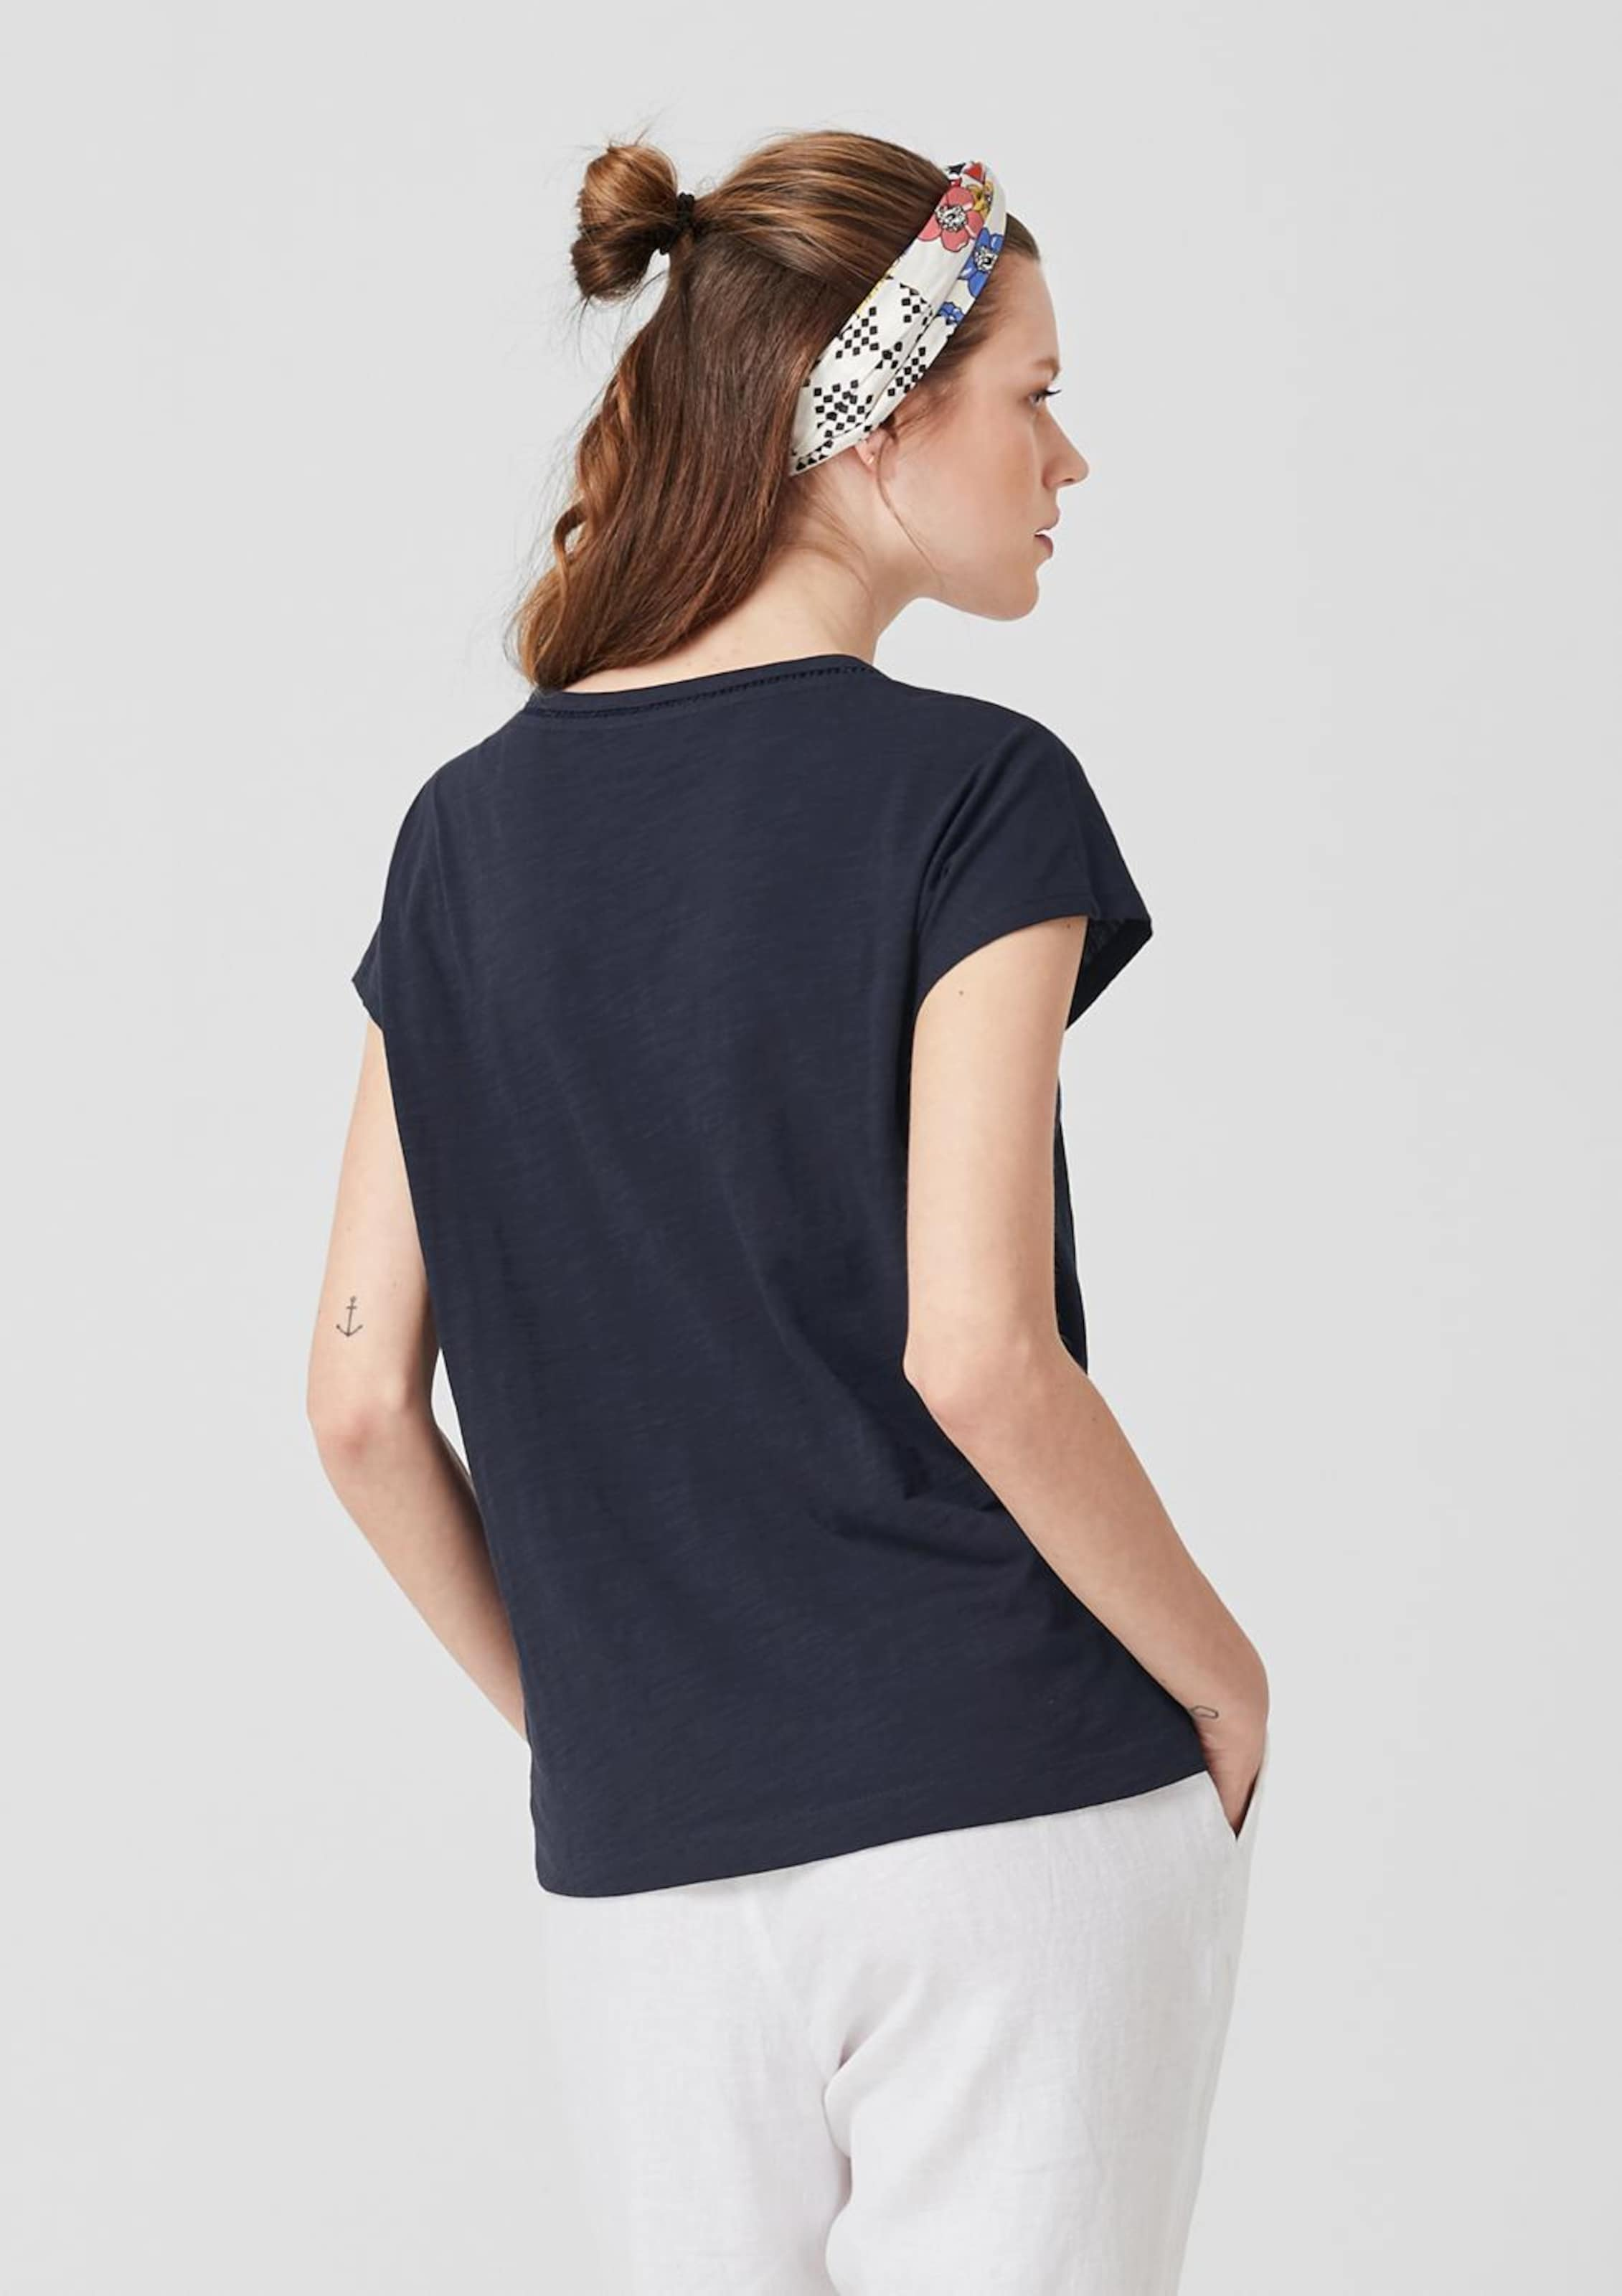 T S oliver Kobaltblau shirt In WDIEH29